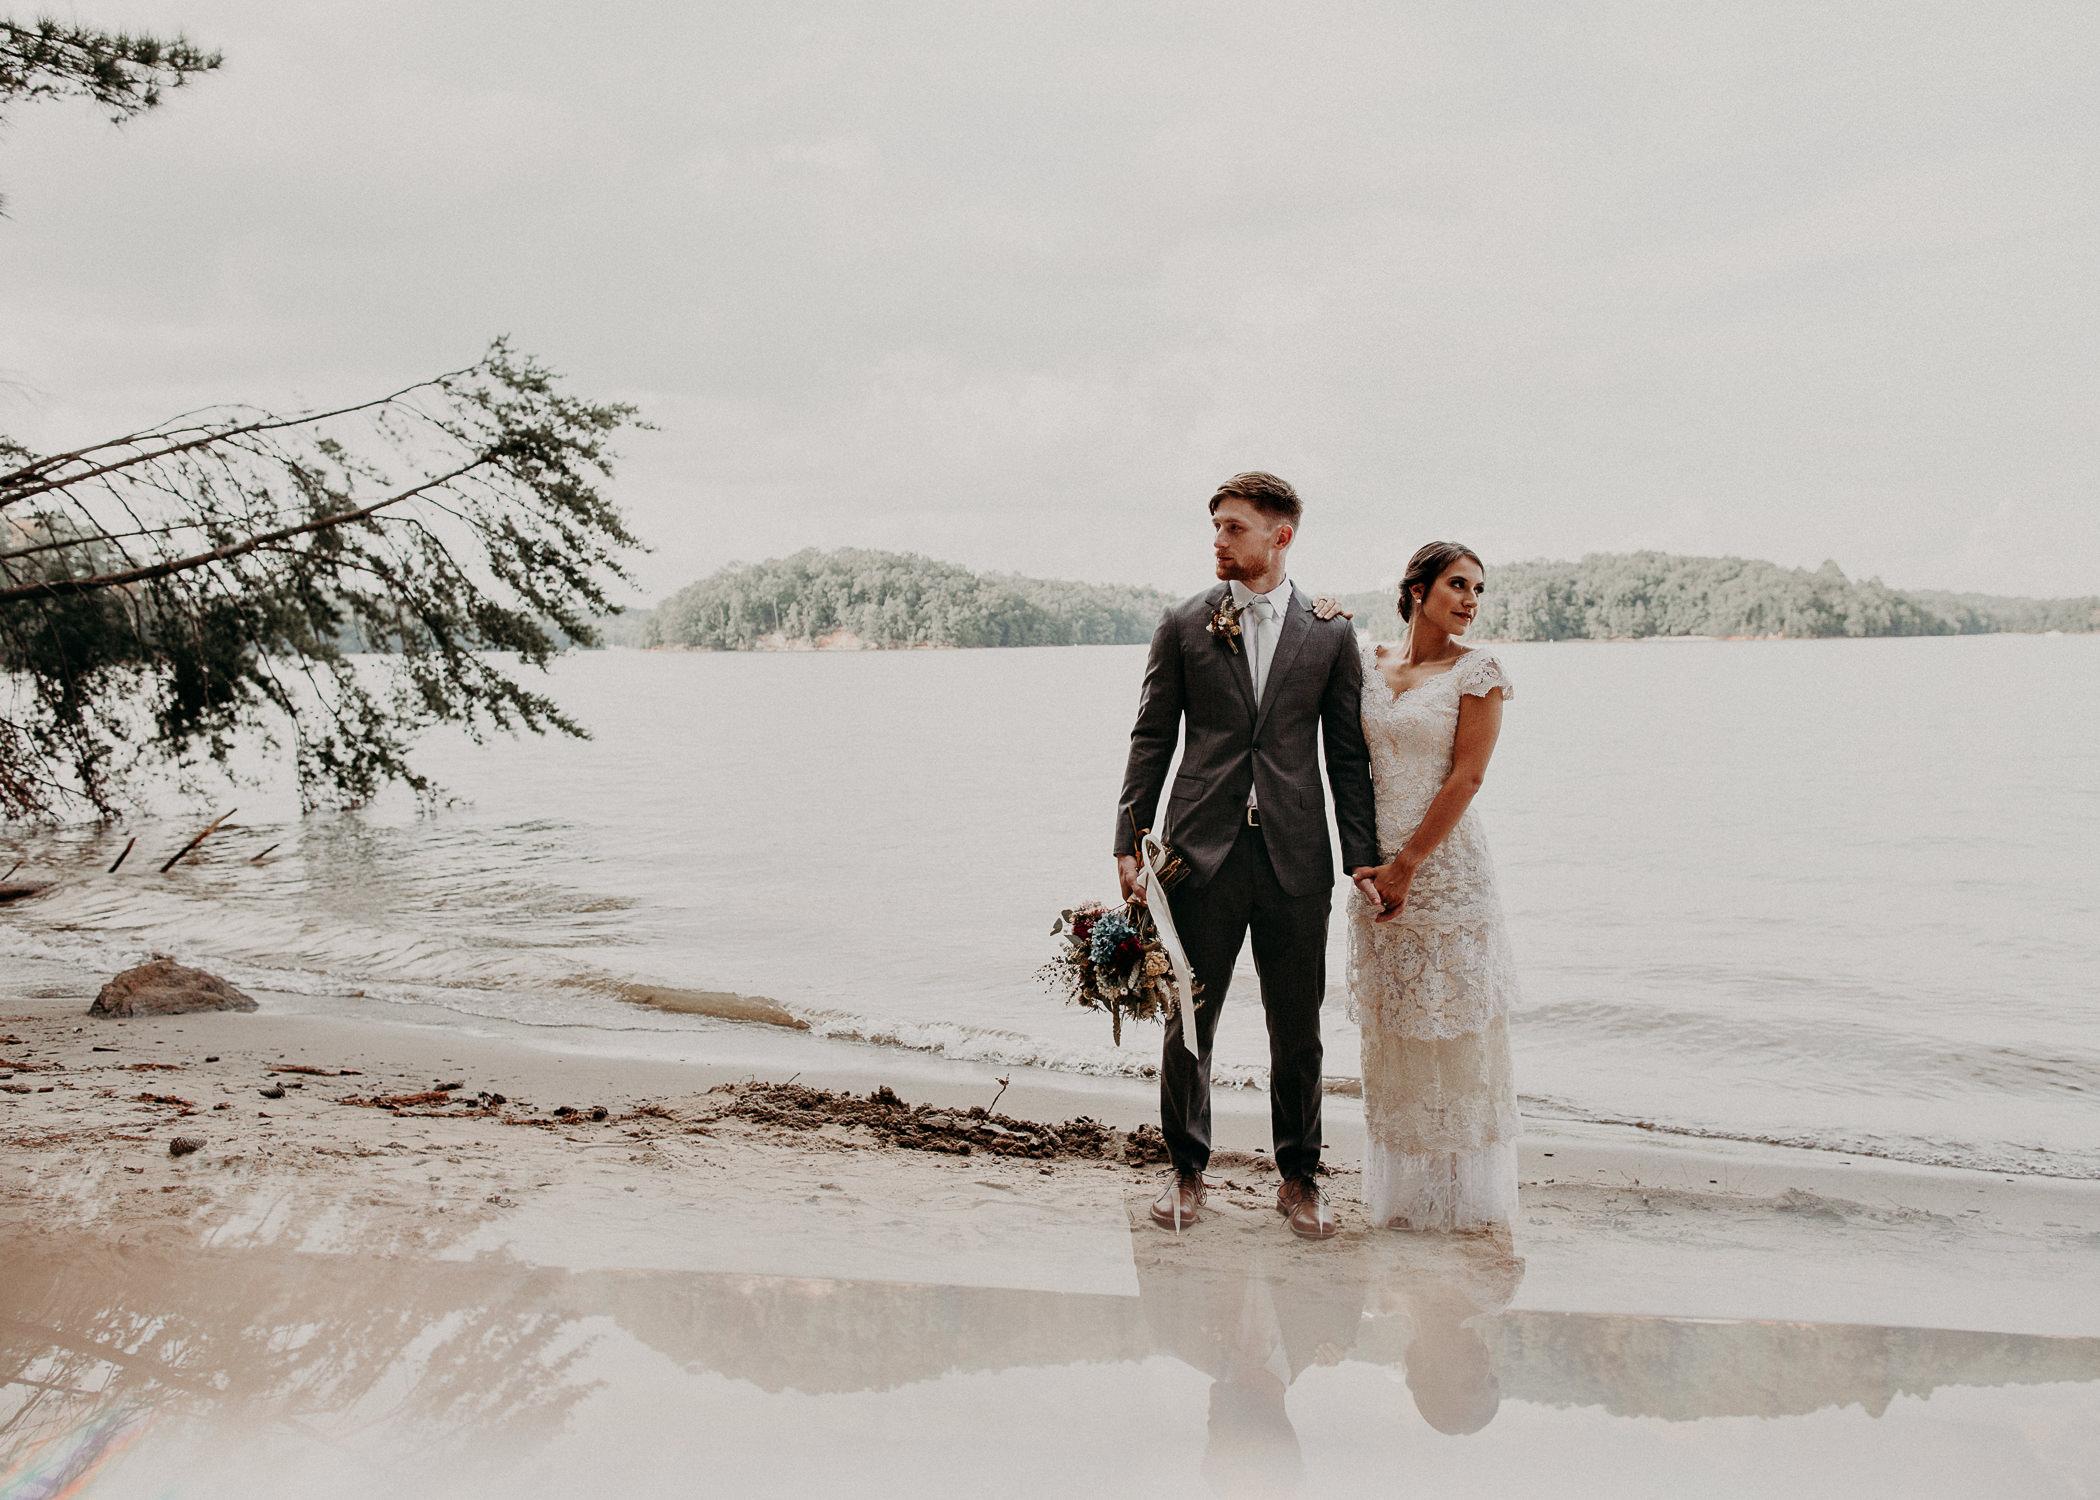 75 Bride & Groom Portraits before the ceremony on wedding day - Atlanta Wedding Photographer .jpg